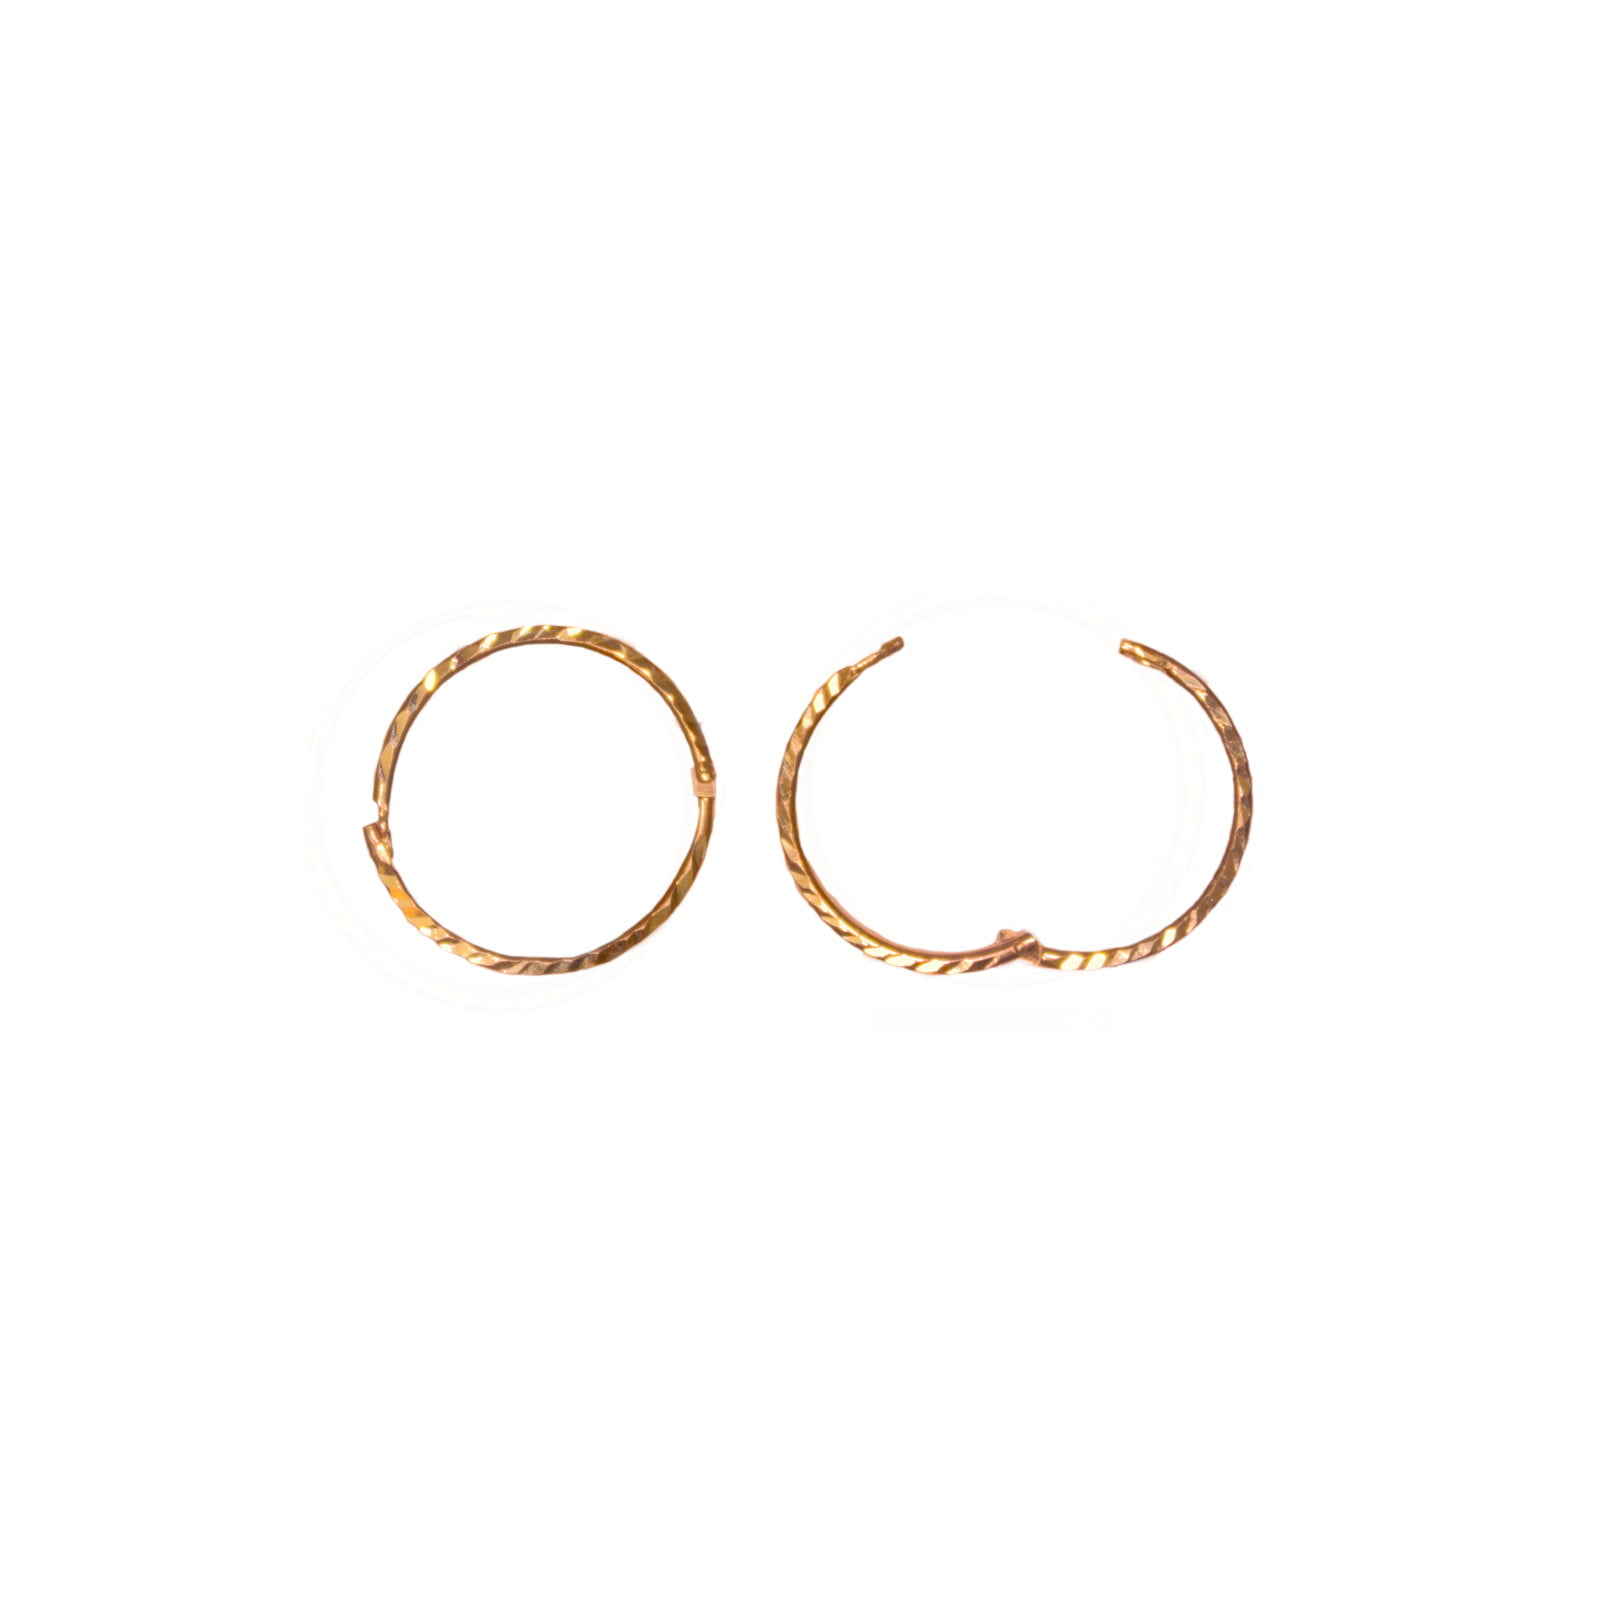 12mm hinged 9ct yellow gold hoop earrings. Diamond cut finish.